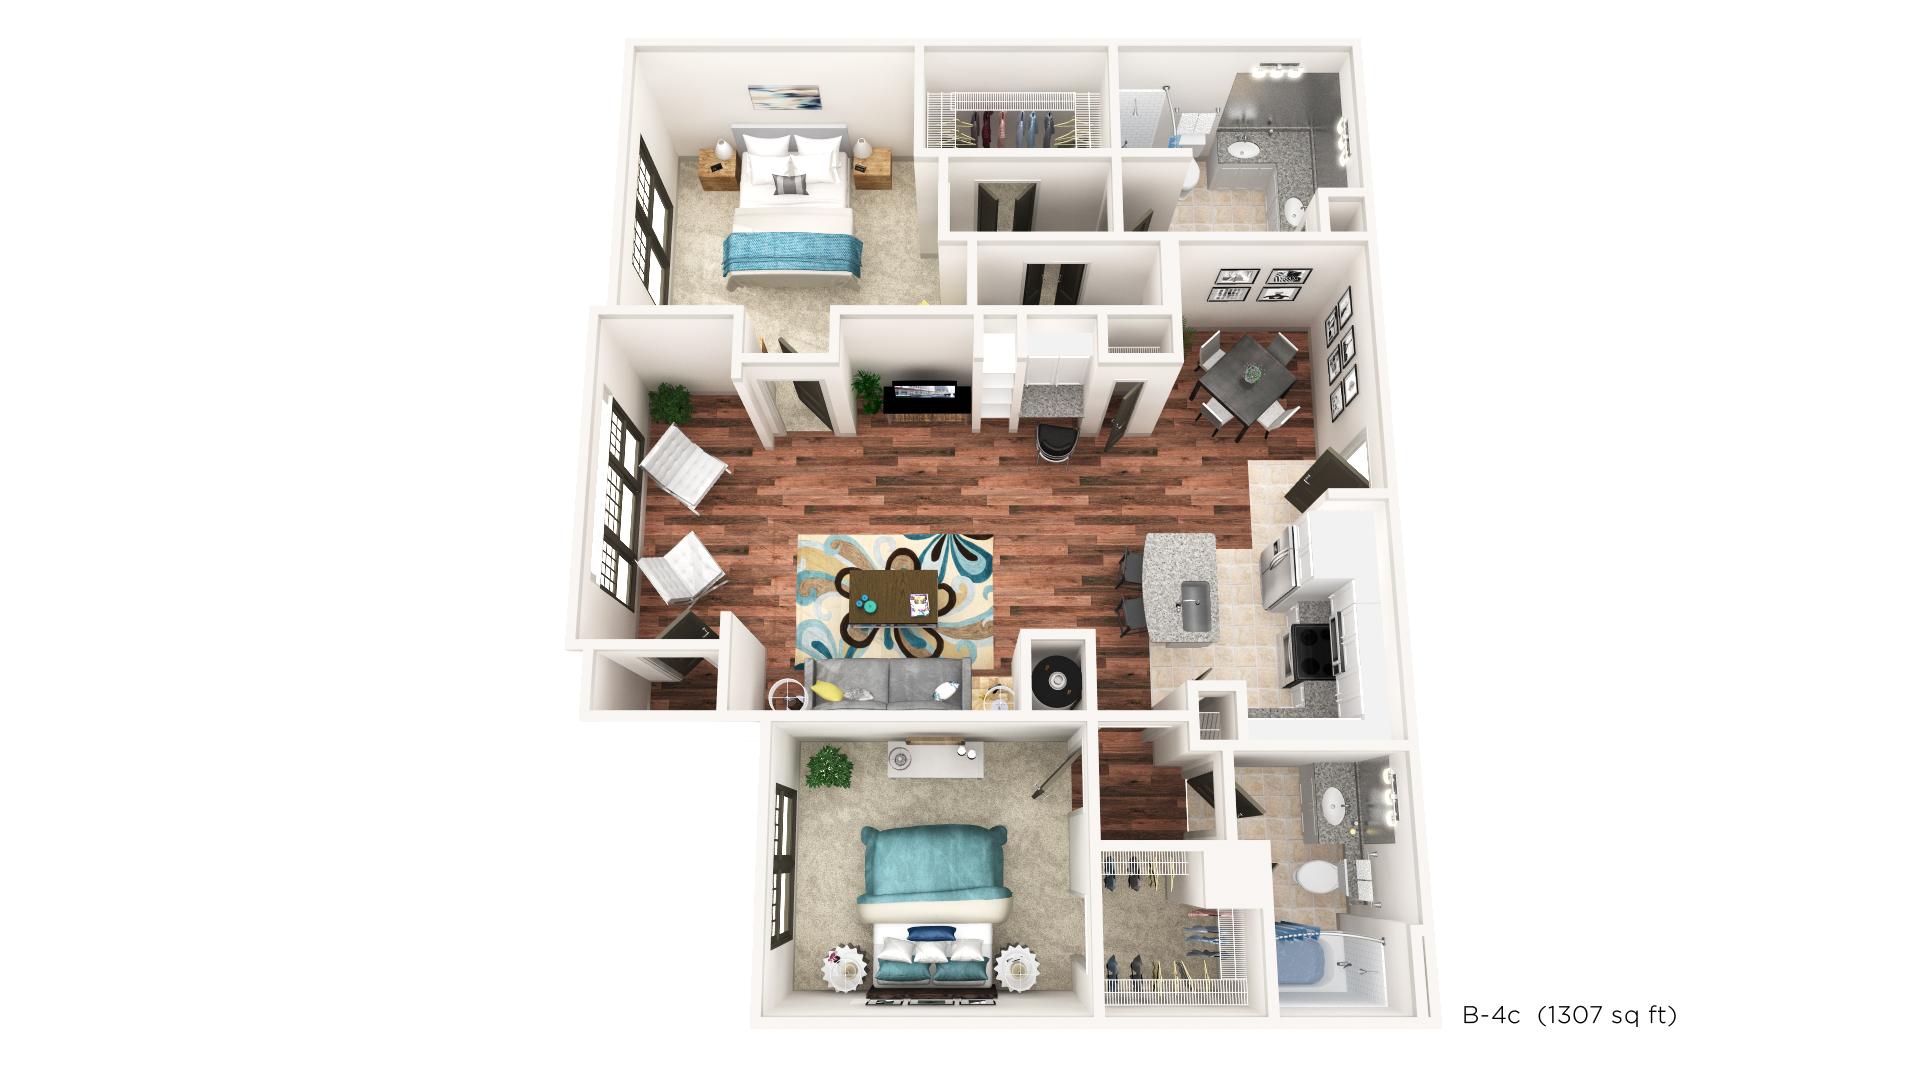 Floorplan - B-4C image